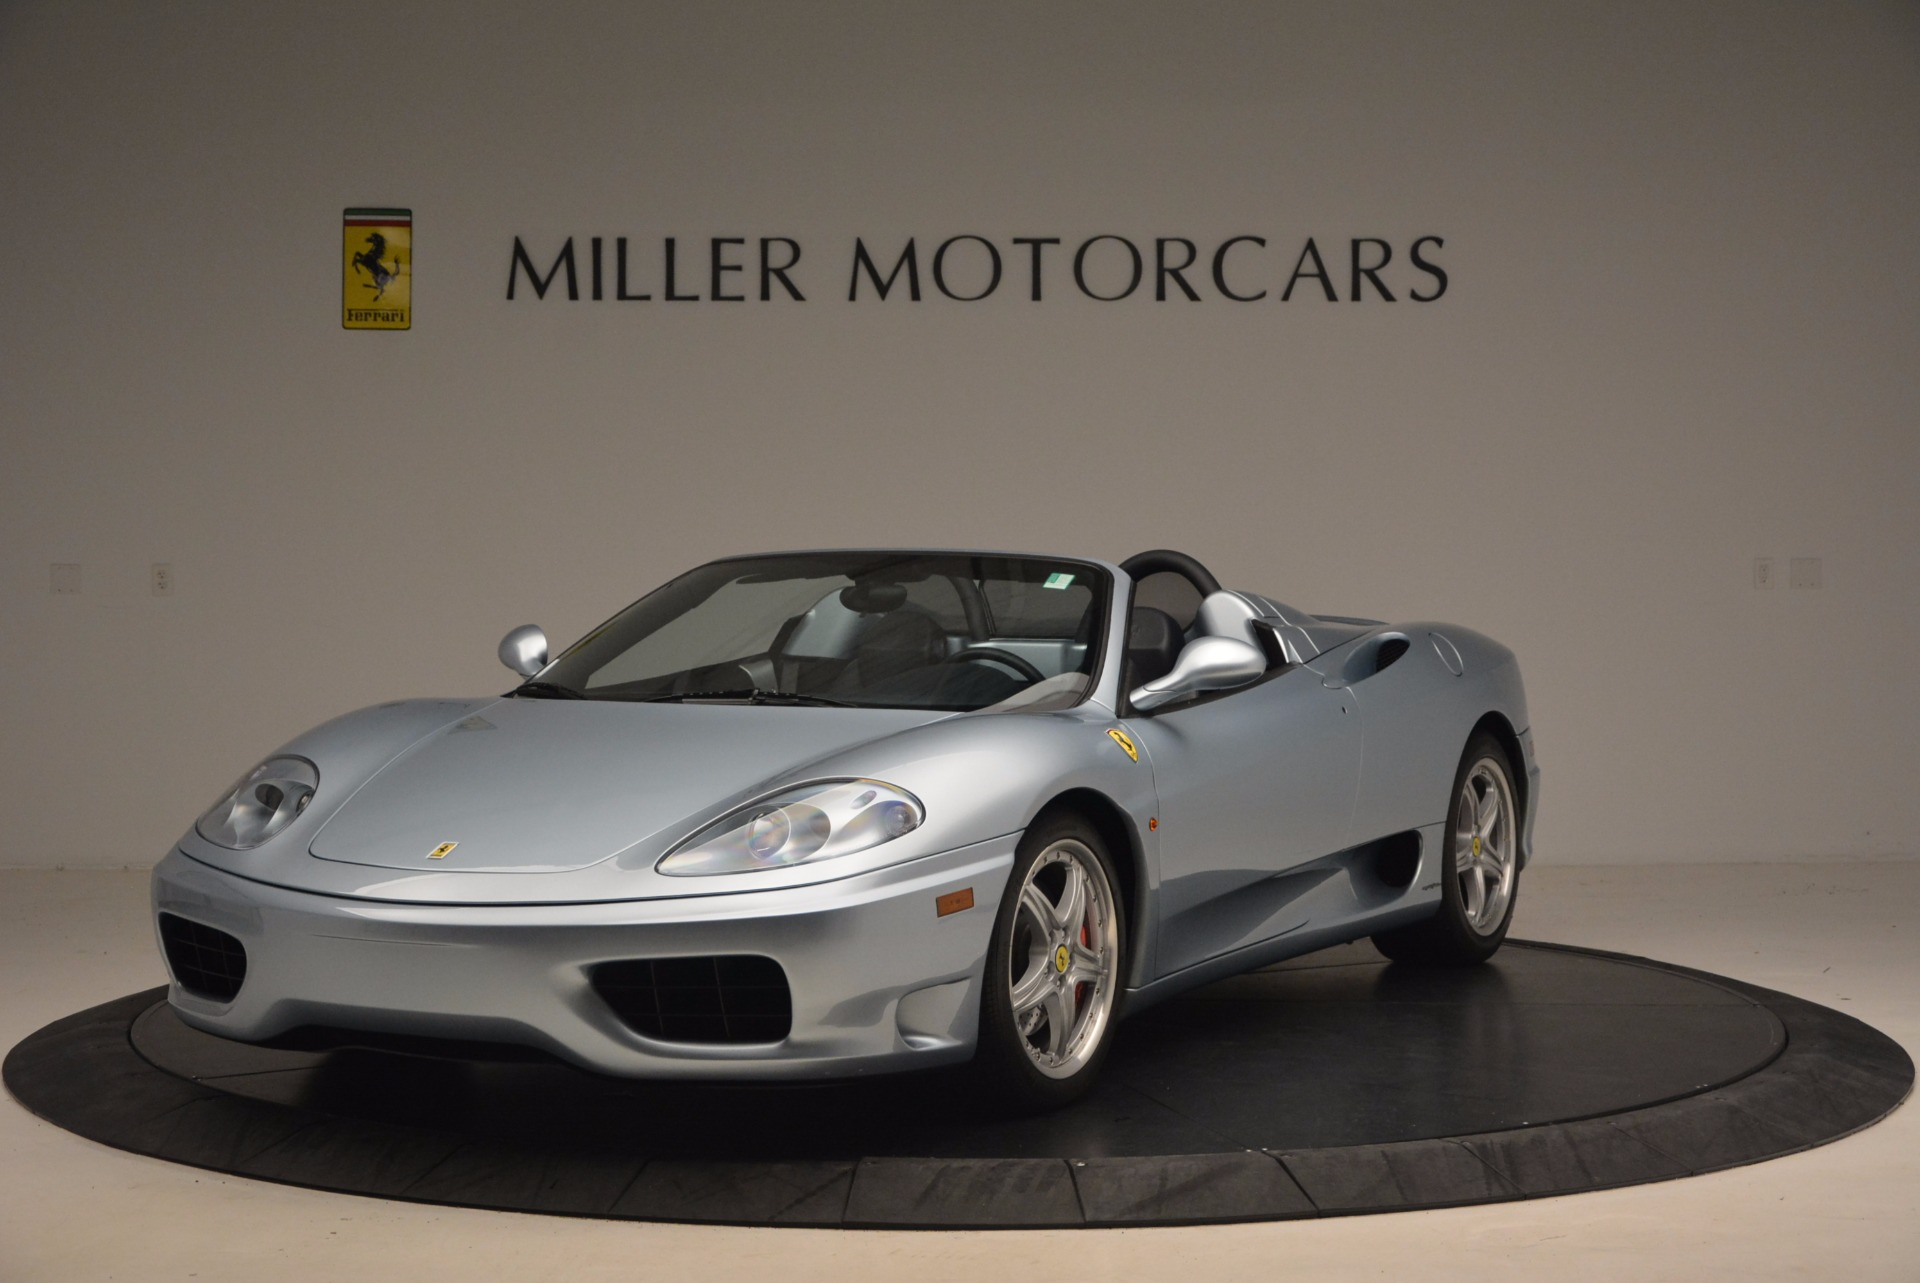 Used 2003 Ferrari 360 Spider 6-Speed Manual For Sale In Westport, CT 1445_main